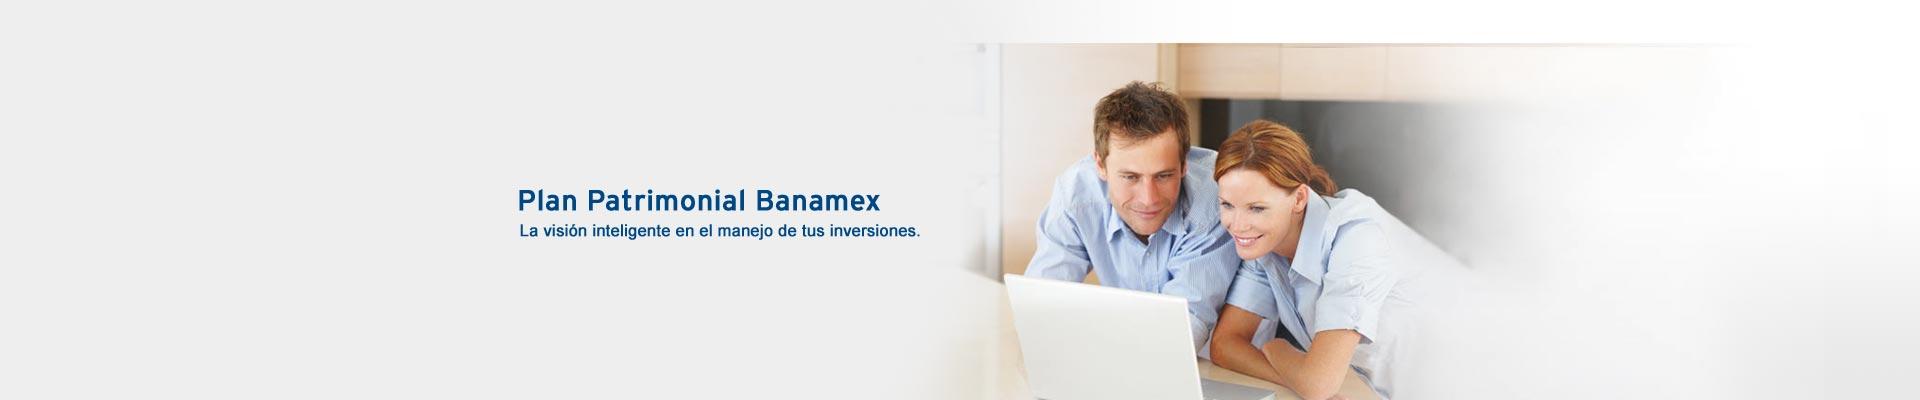 www banamex com personas herramientas: